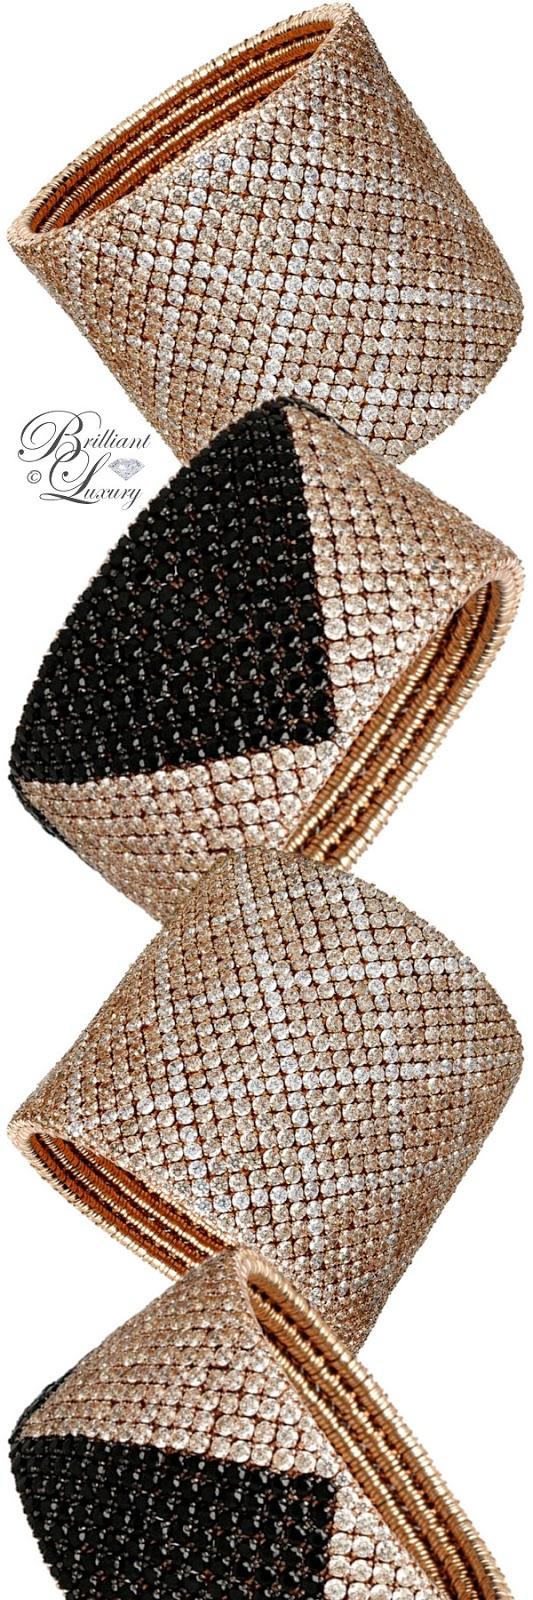 Brilliant Luxury ♦ Roberto Demeglio Cashmere Gold Bracelet With Diamonds